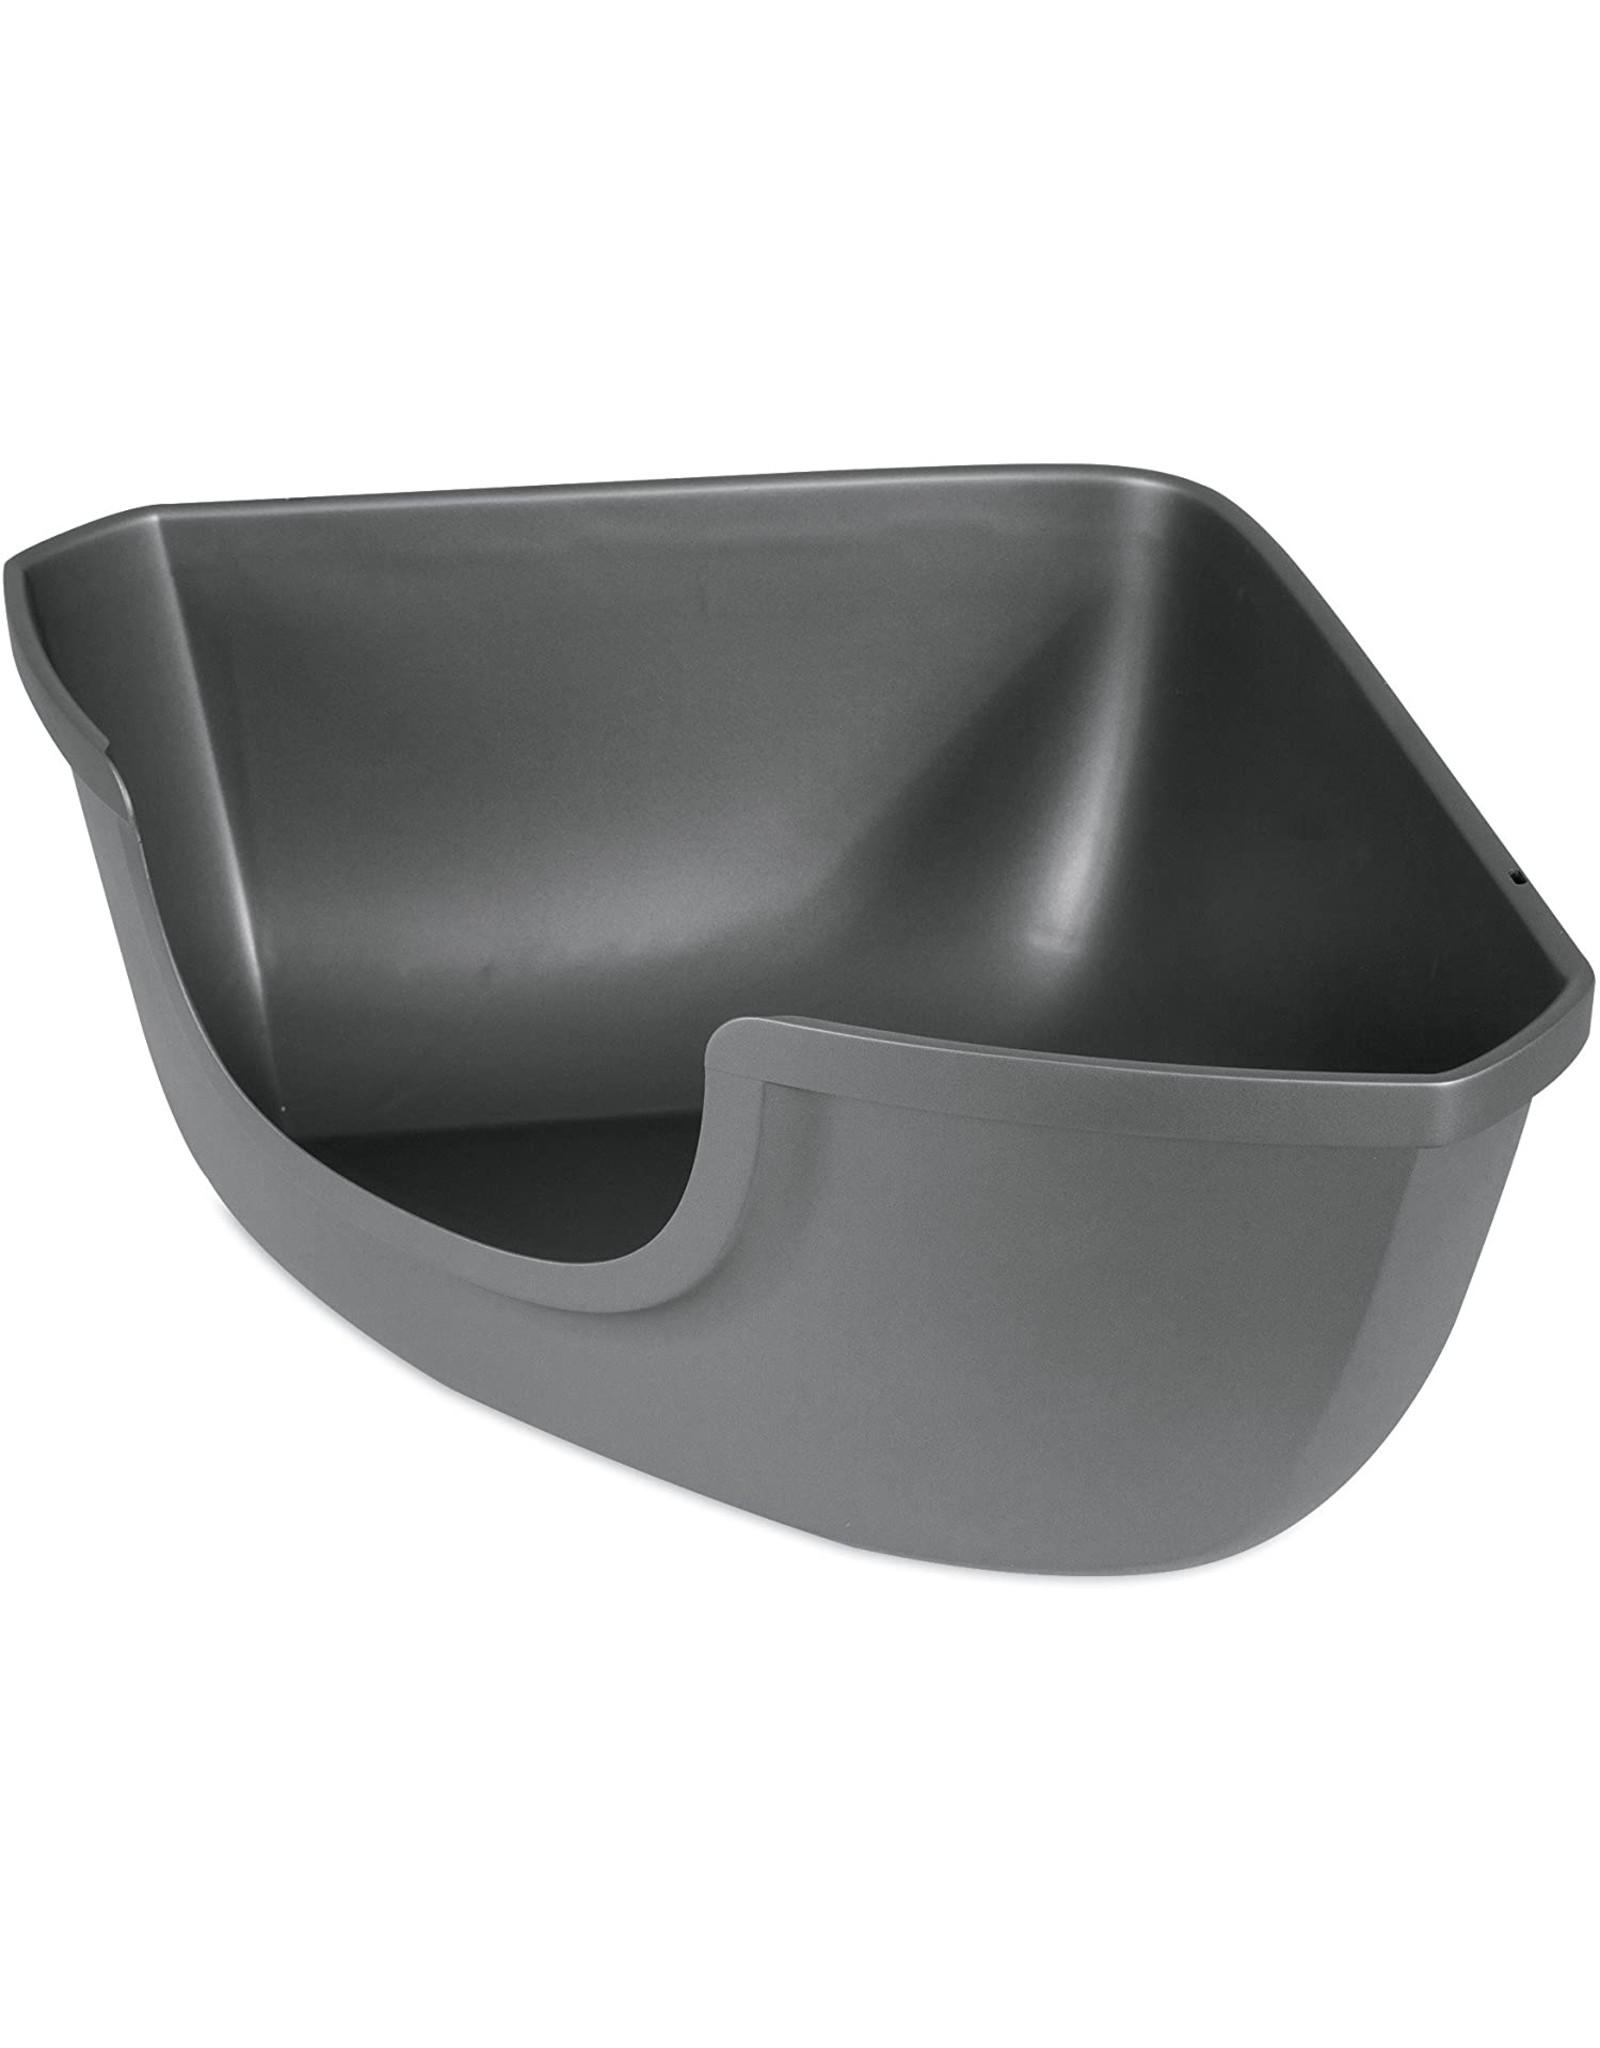 Petmate PETMATE CORNER OPEN LITTER PAN